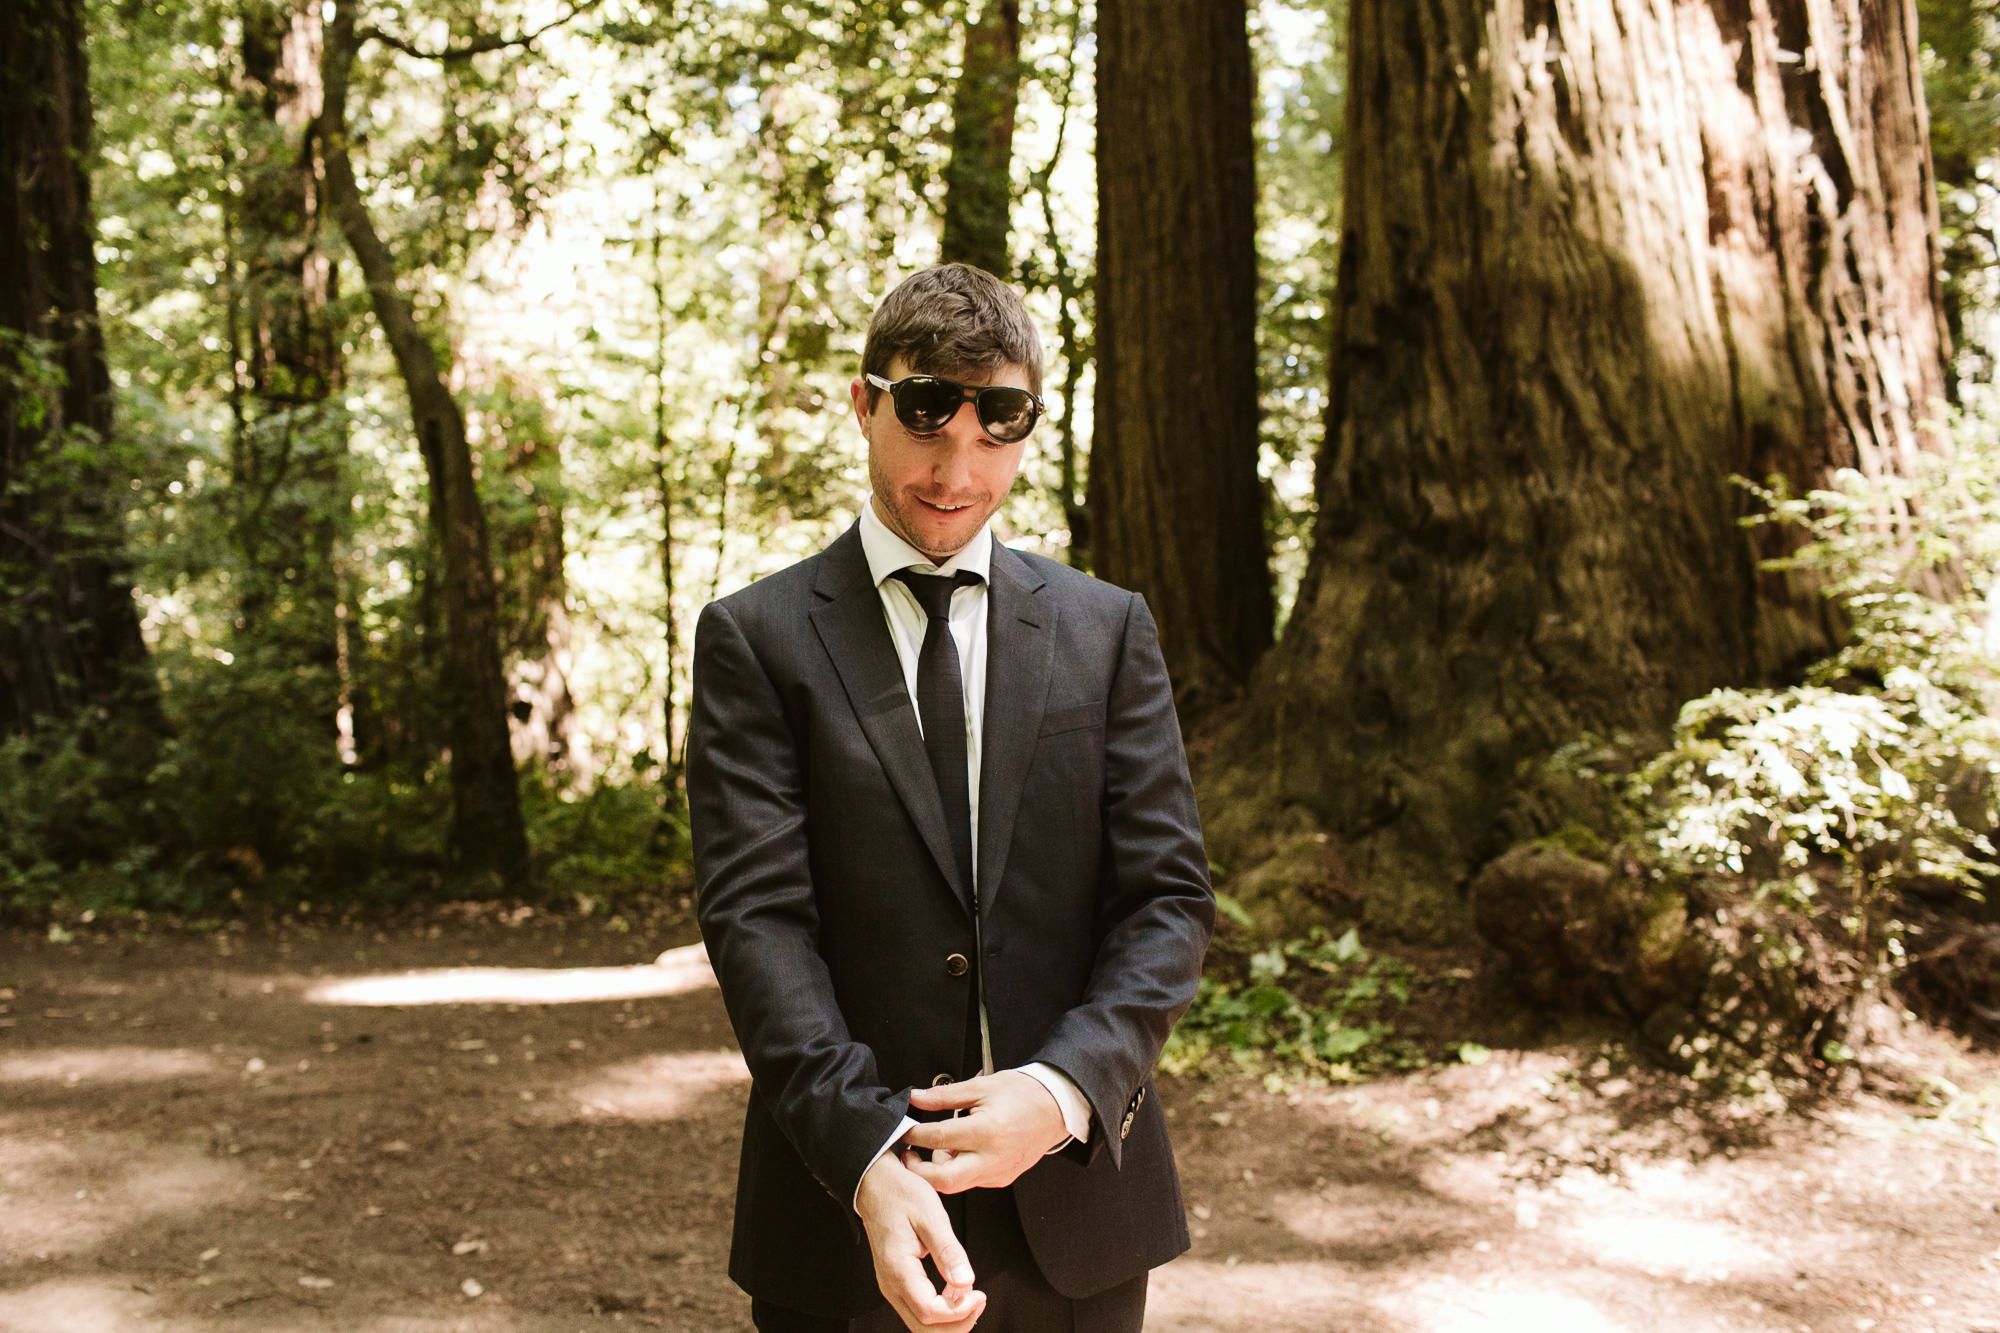 California-wedding-photographer-alfonso-flores-pamplin-groove-135.jpg